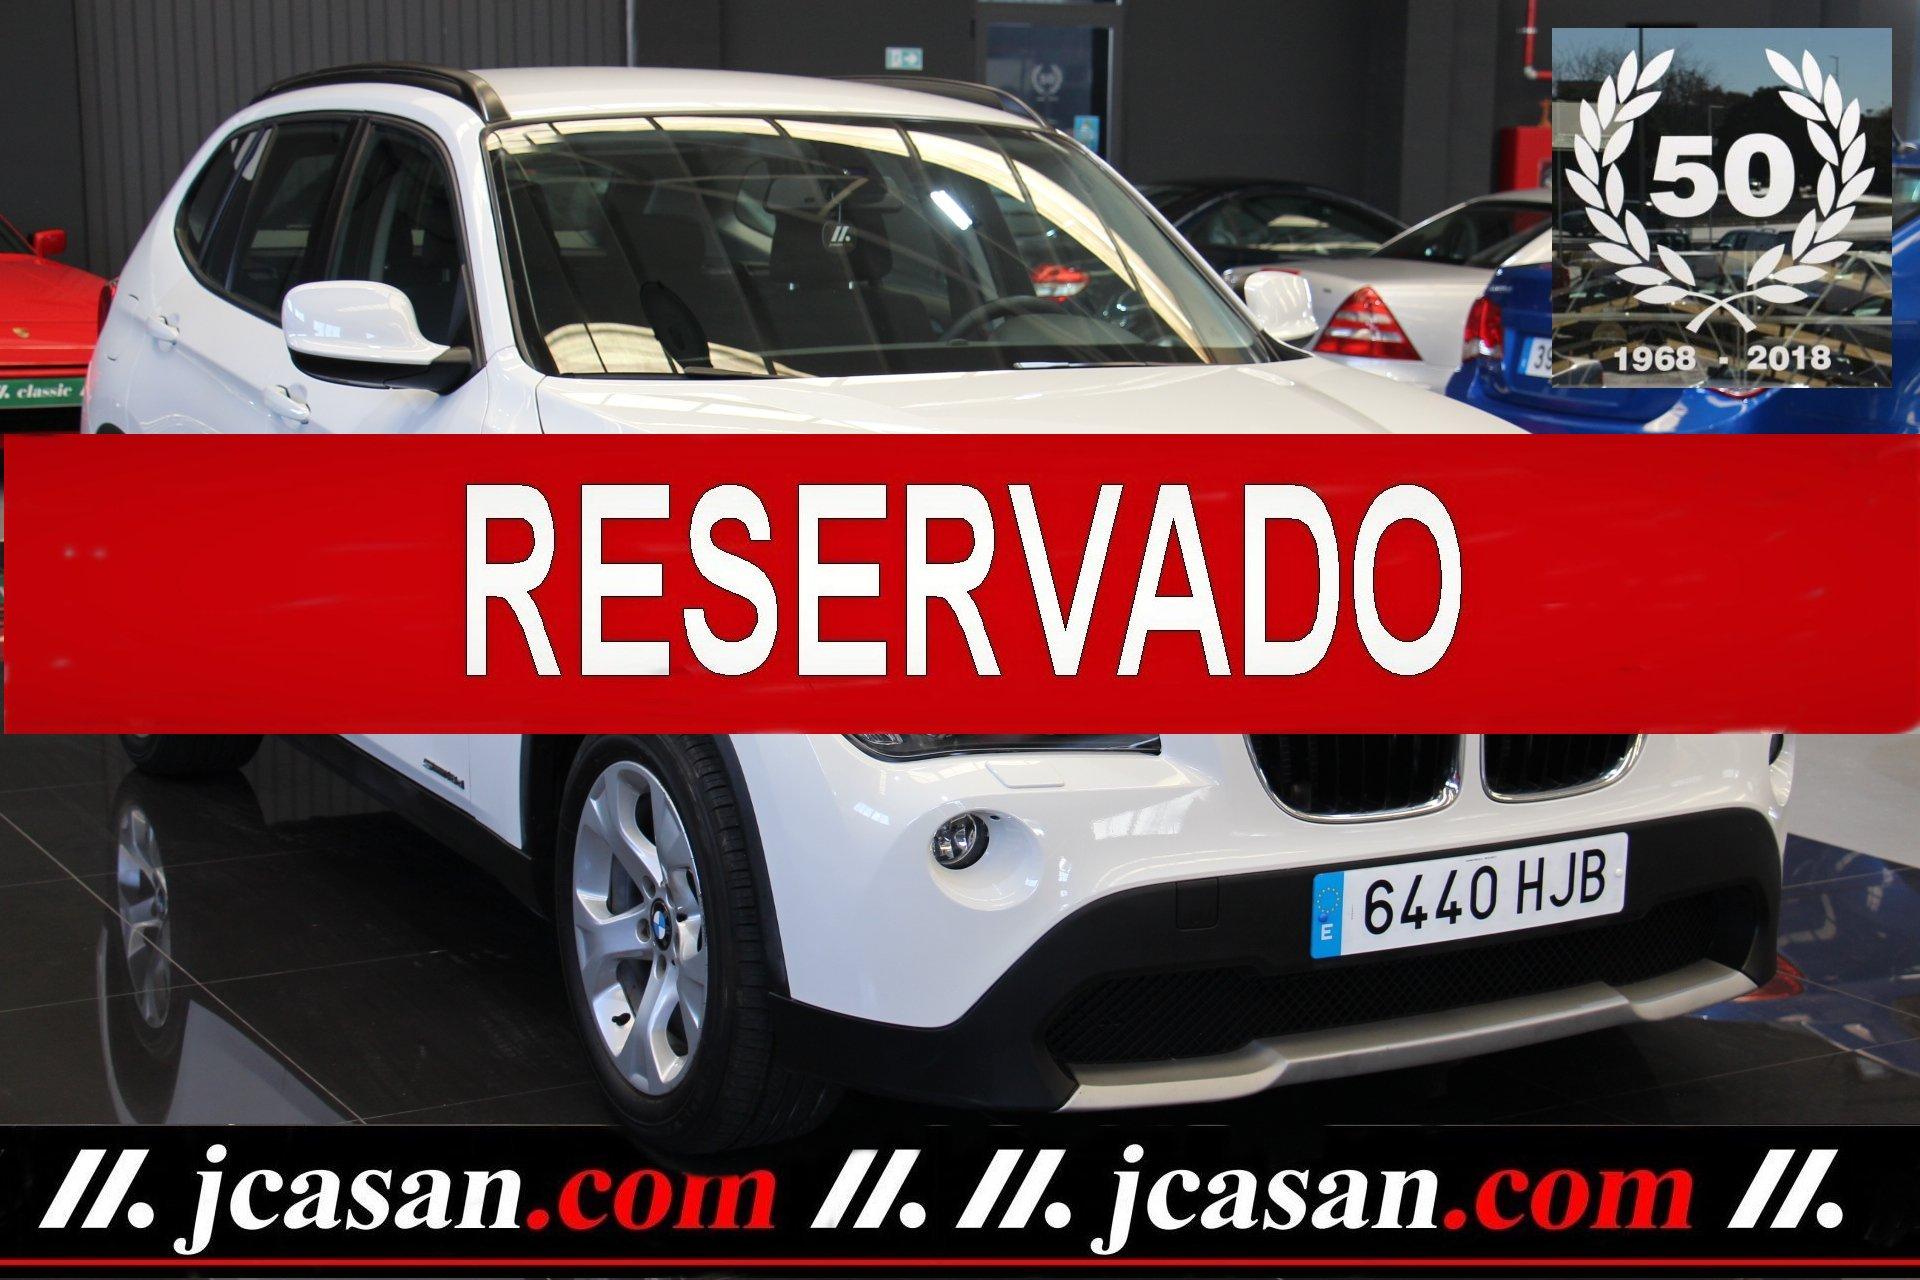 BMW X1 1.8d SDRIVE 143 CV 6 Velocidades